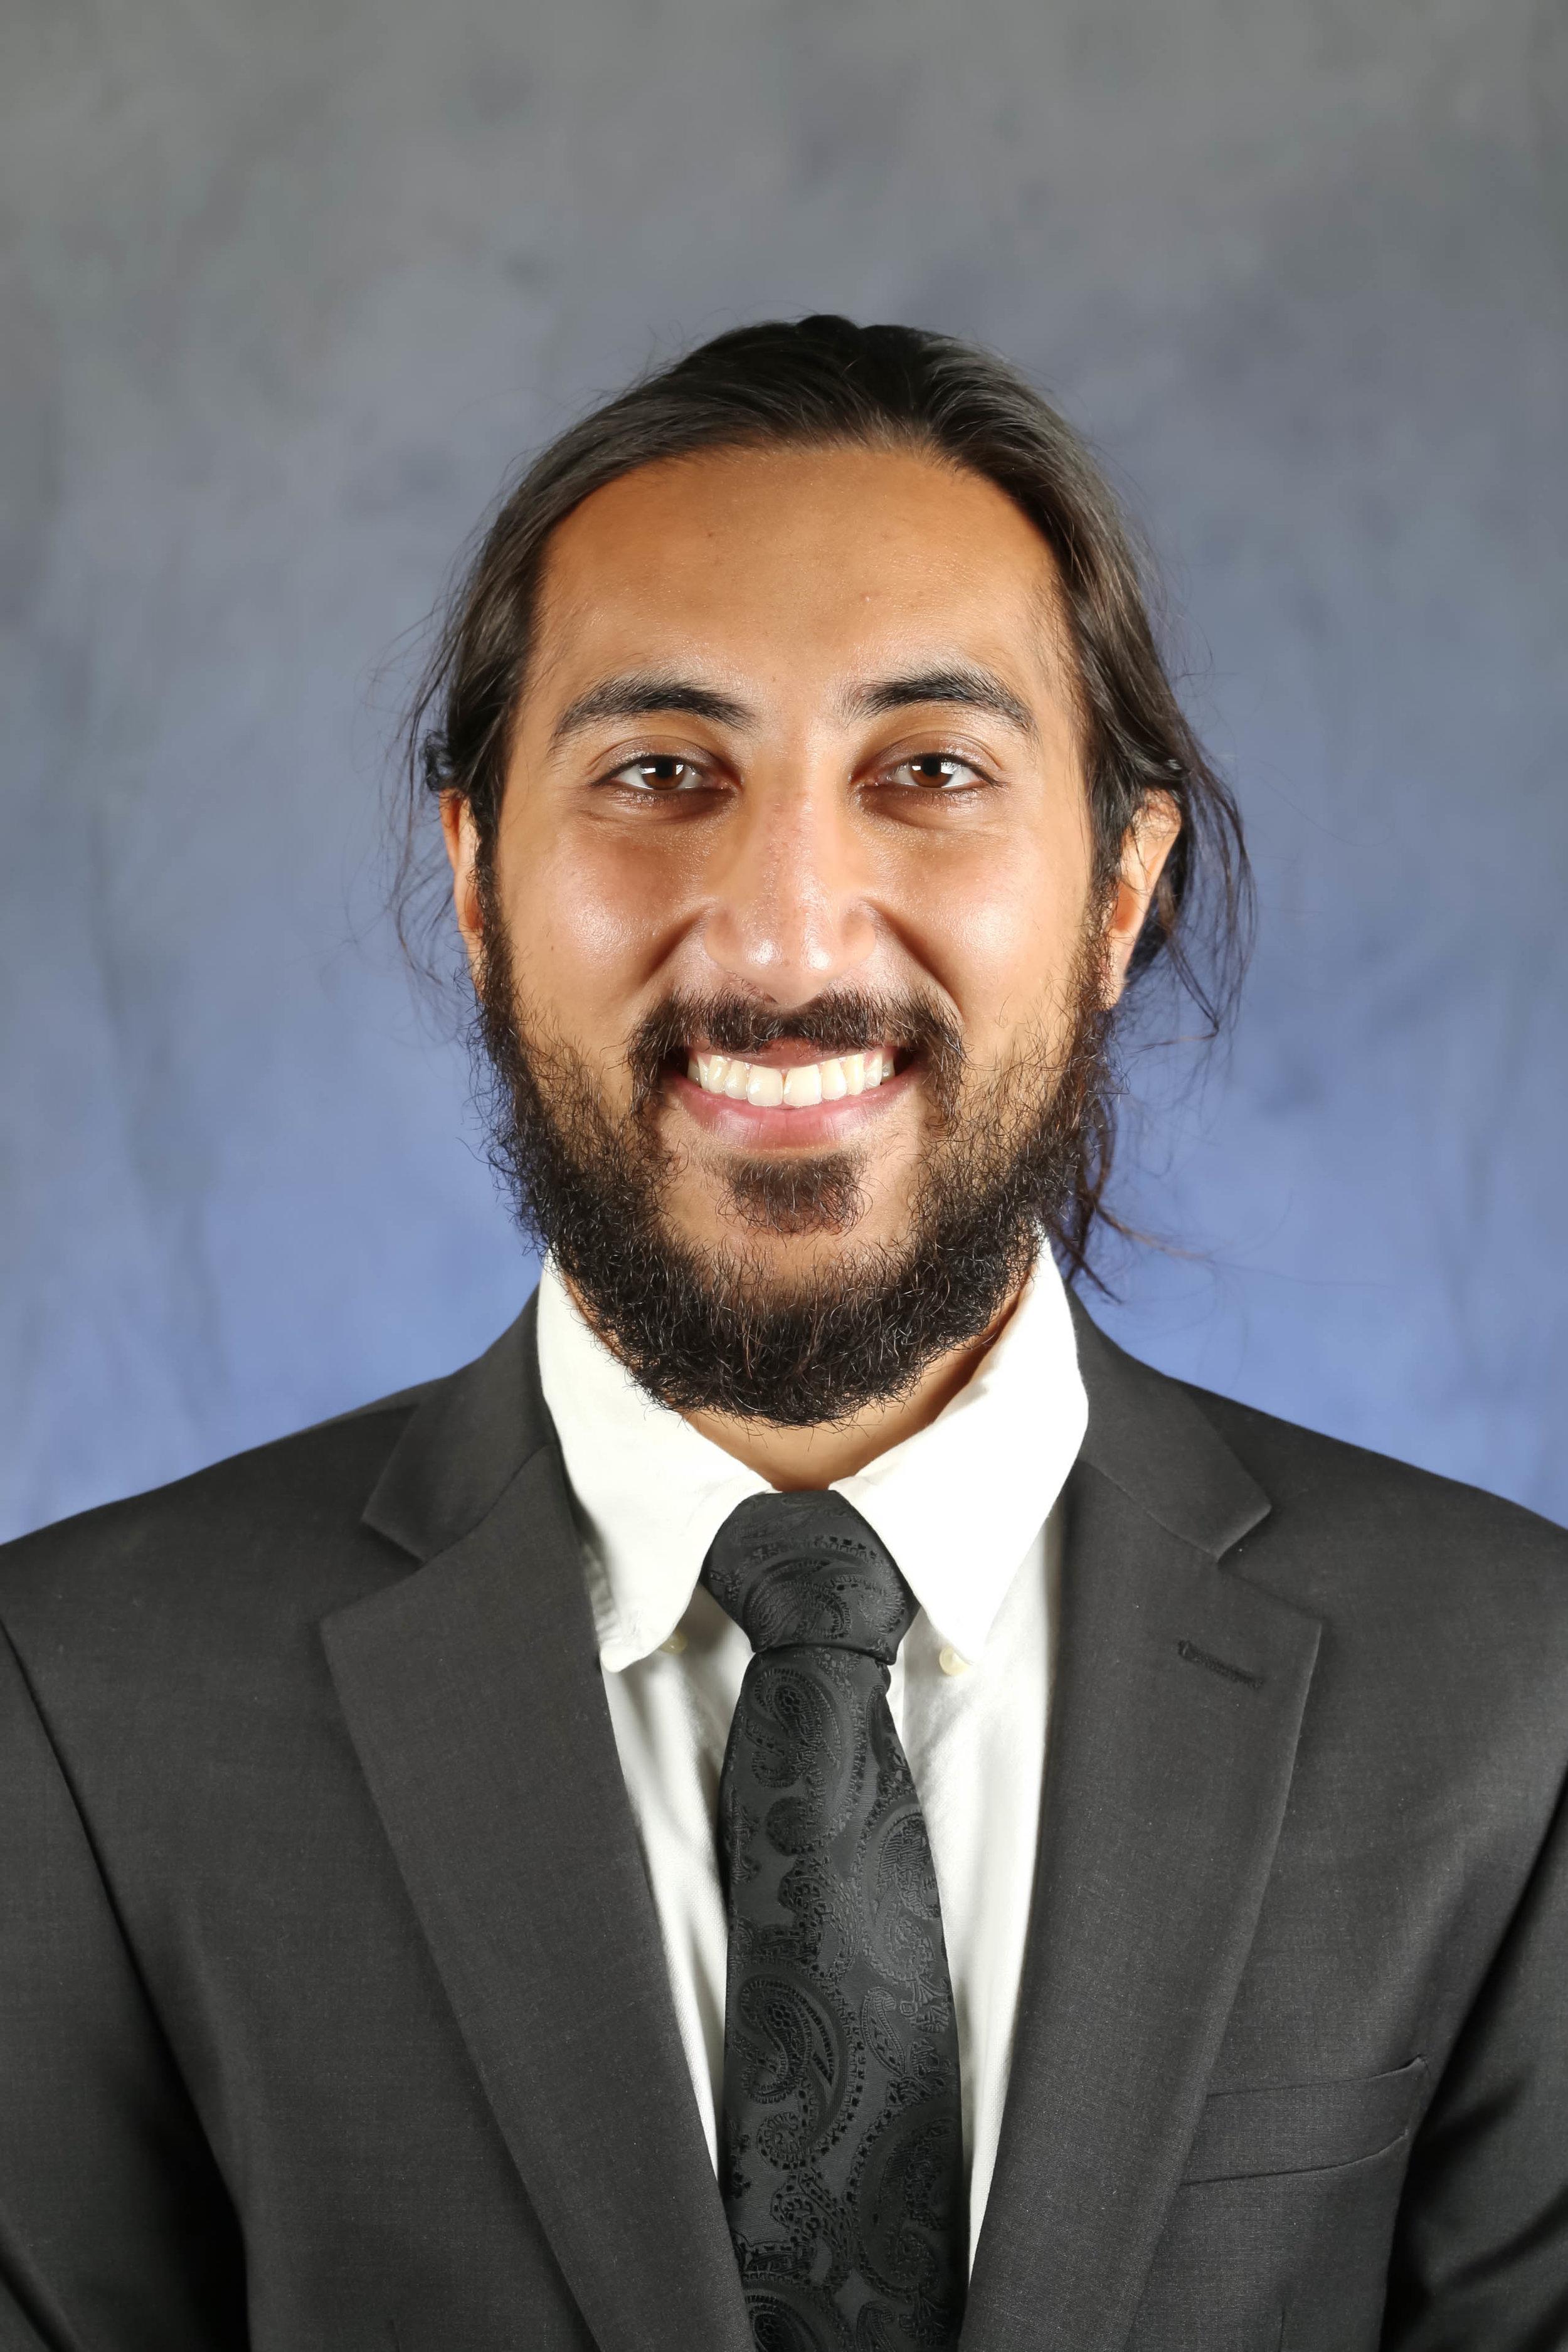 Sanjum Singh - VP of Fundraising